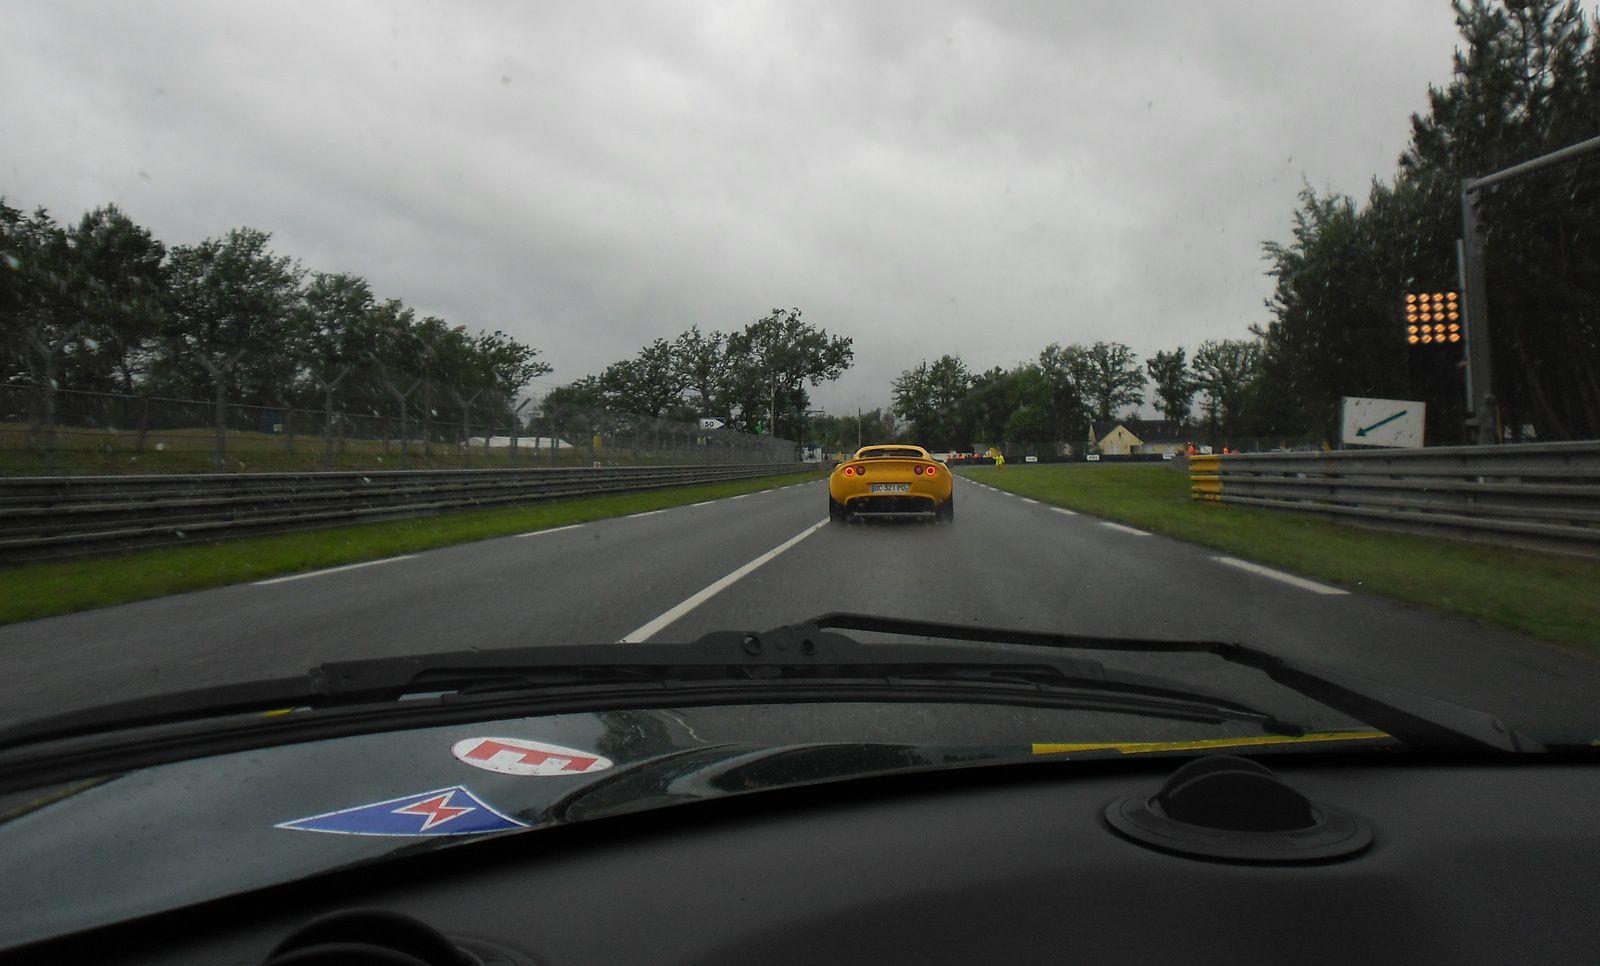 2012 - 24 Heures du Mans